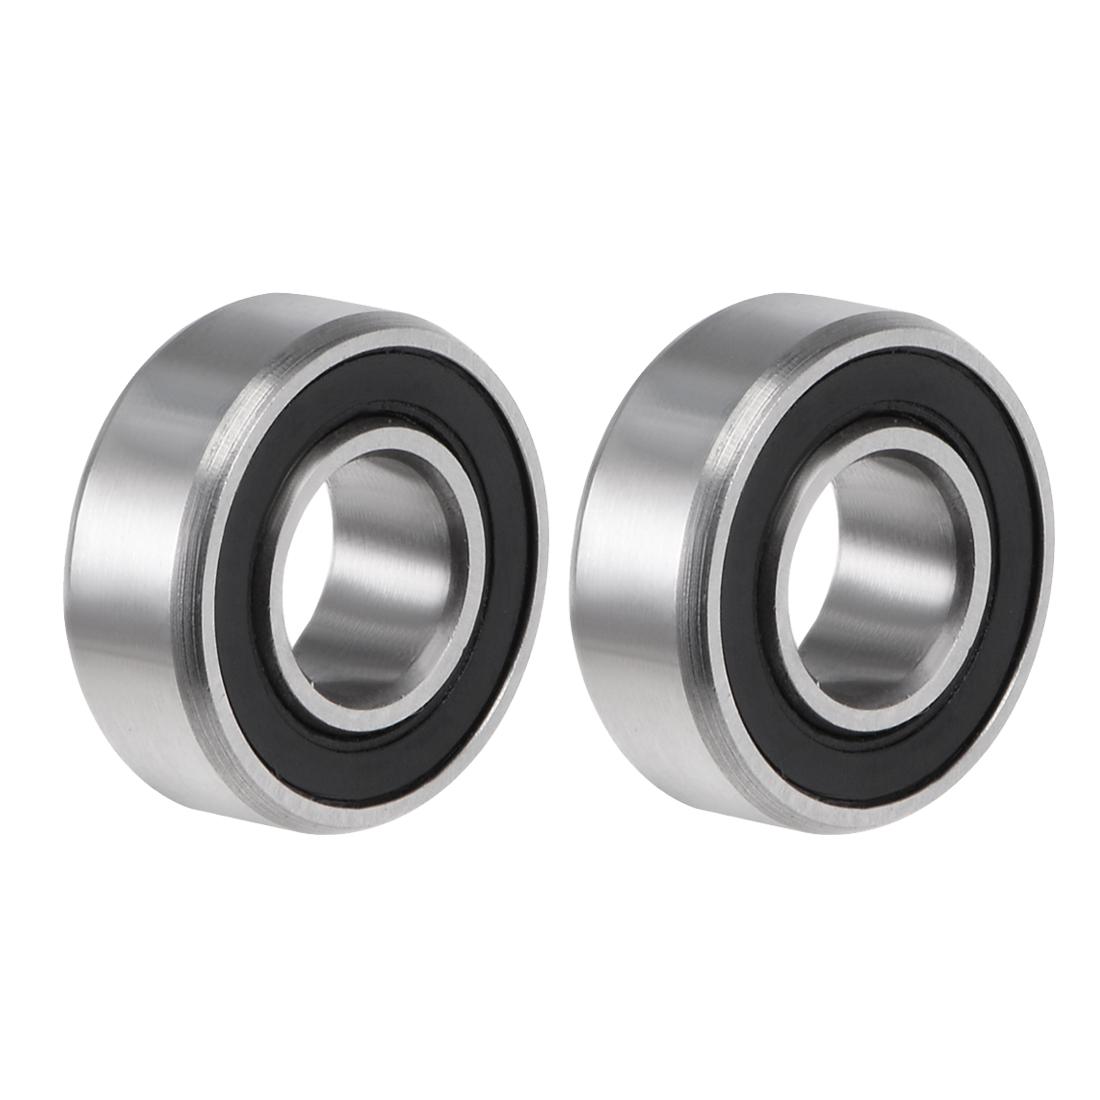 MR115-2RS Ball Bearing 5x11x4mm Double Sealed ABEC-3 Bearings 2pcs